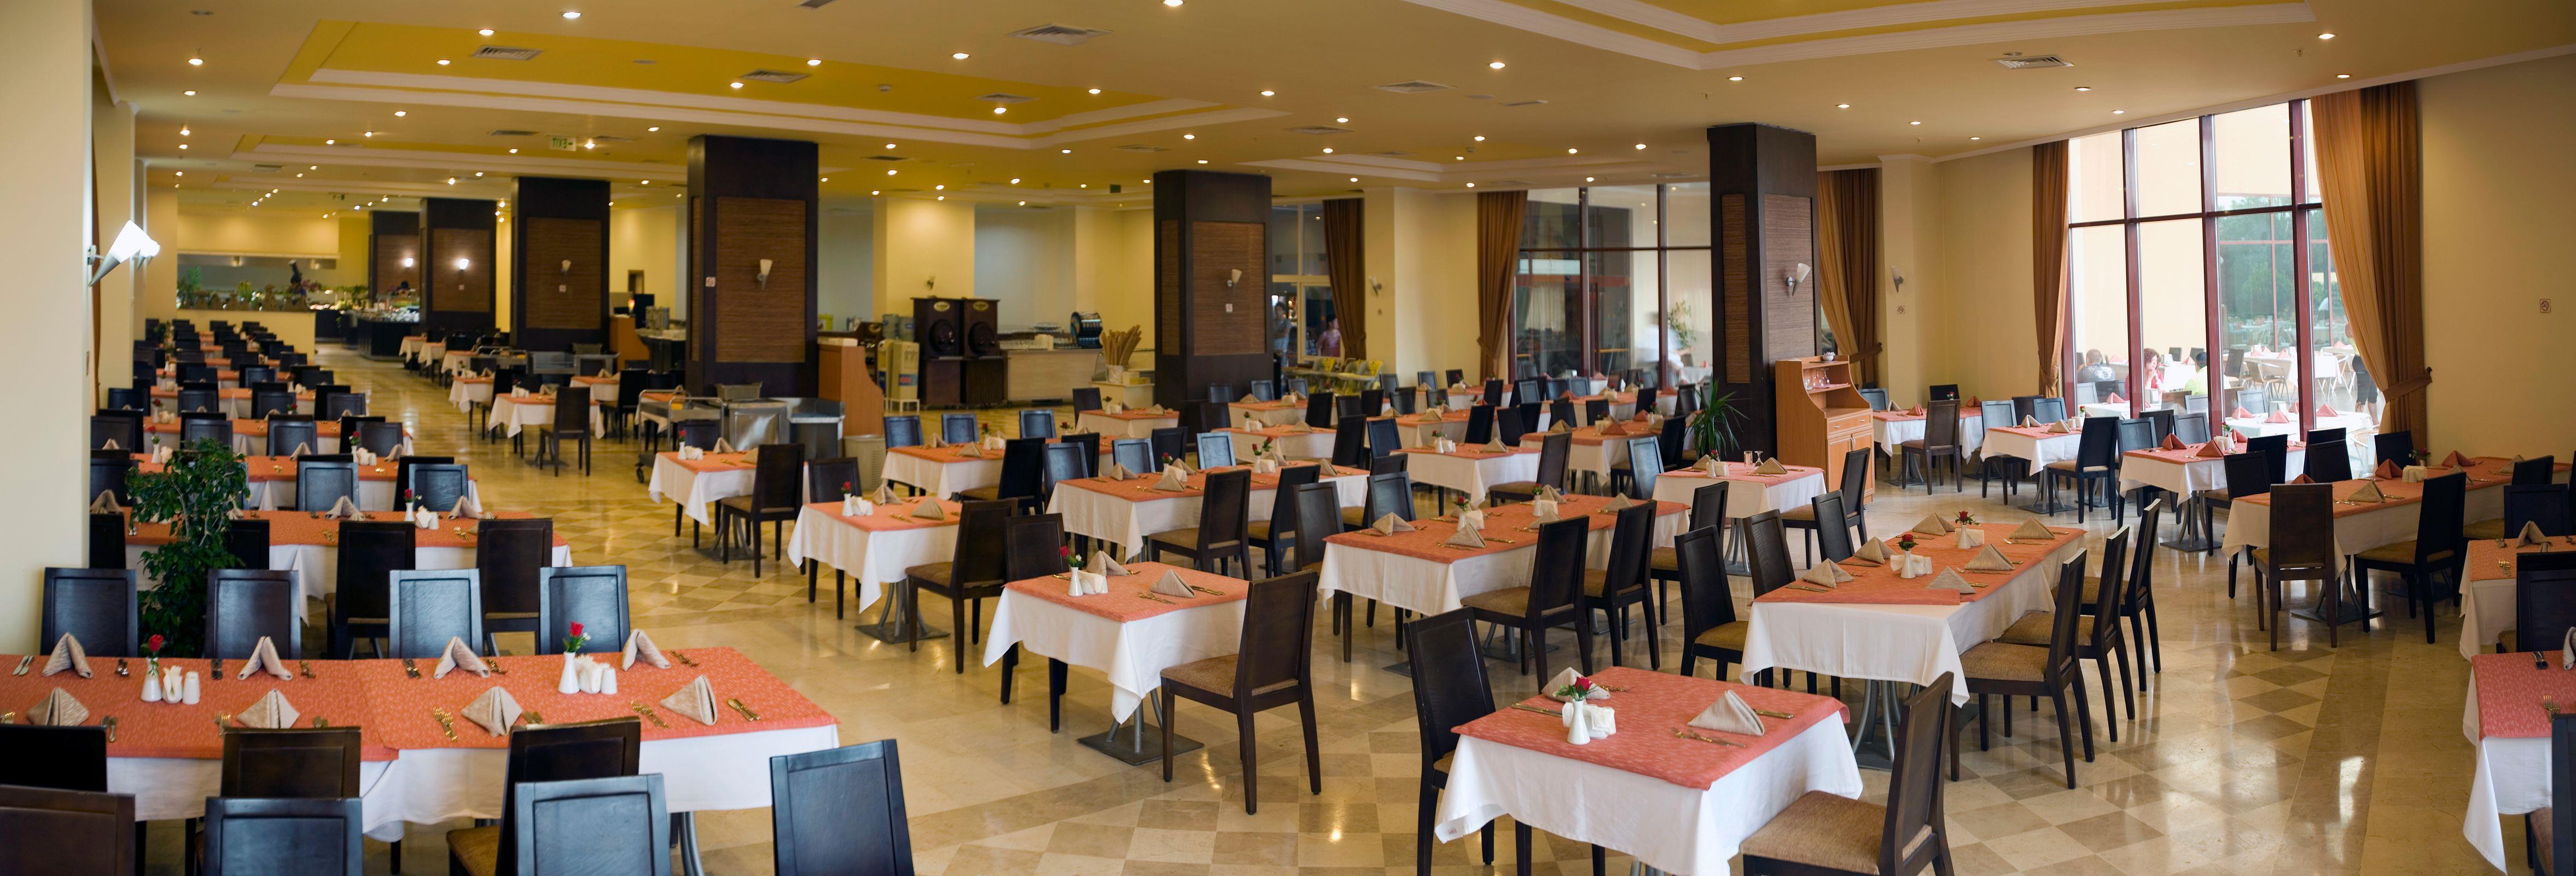 http://www.orextravel.sk/OREX/hotelphotos/stella-beach-hotel-alanya-general-0018.jpg